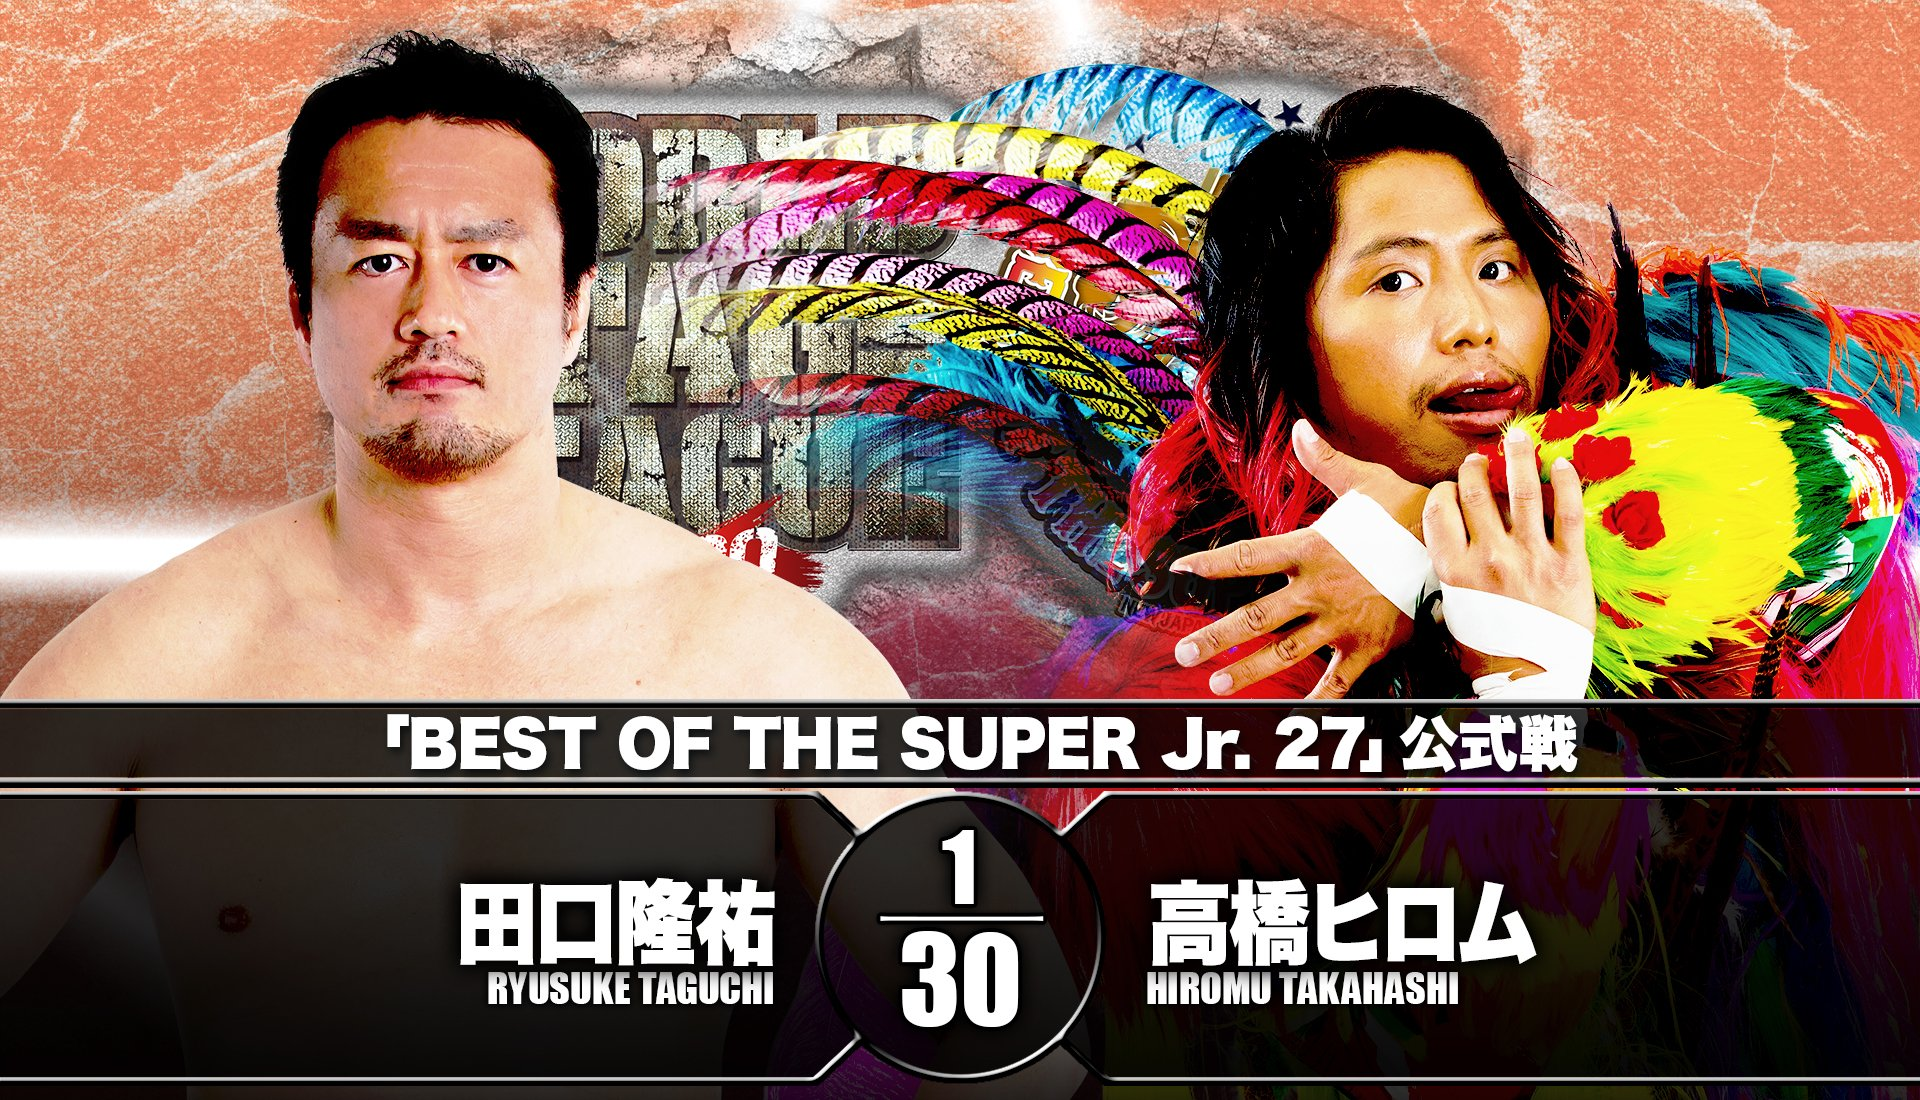 Taguchi vs Hiromu BOSJ 27